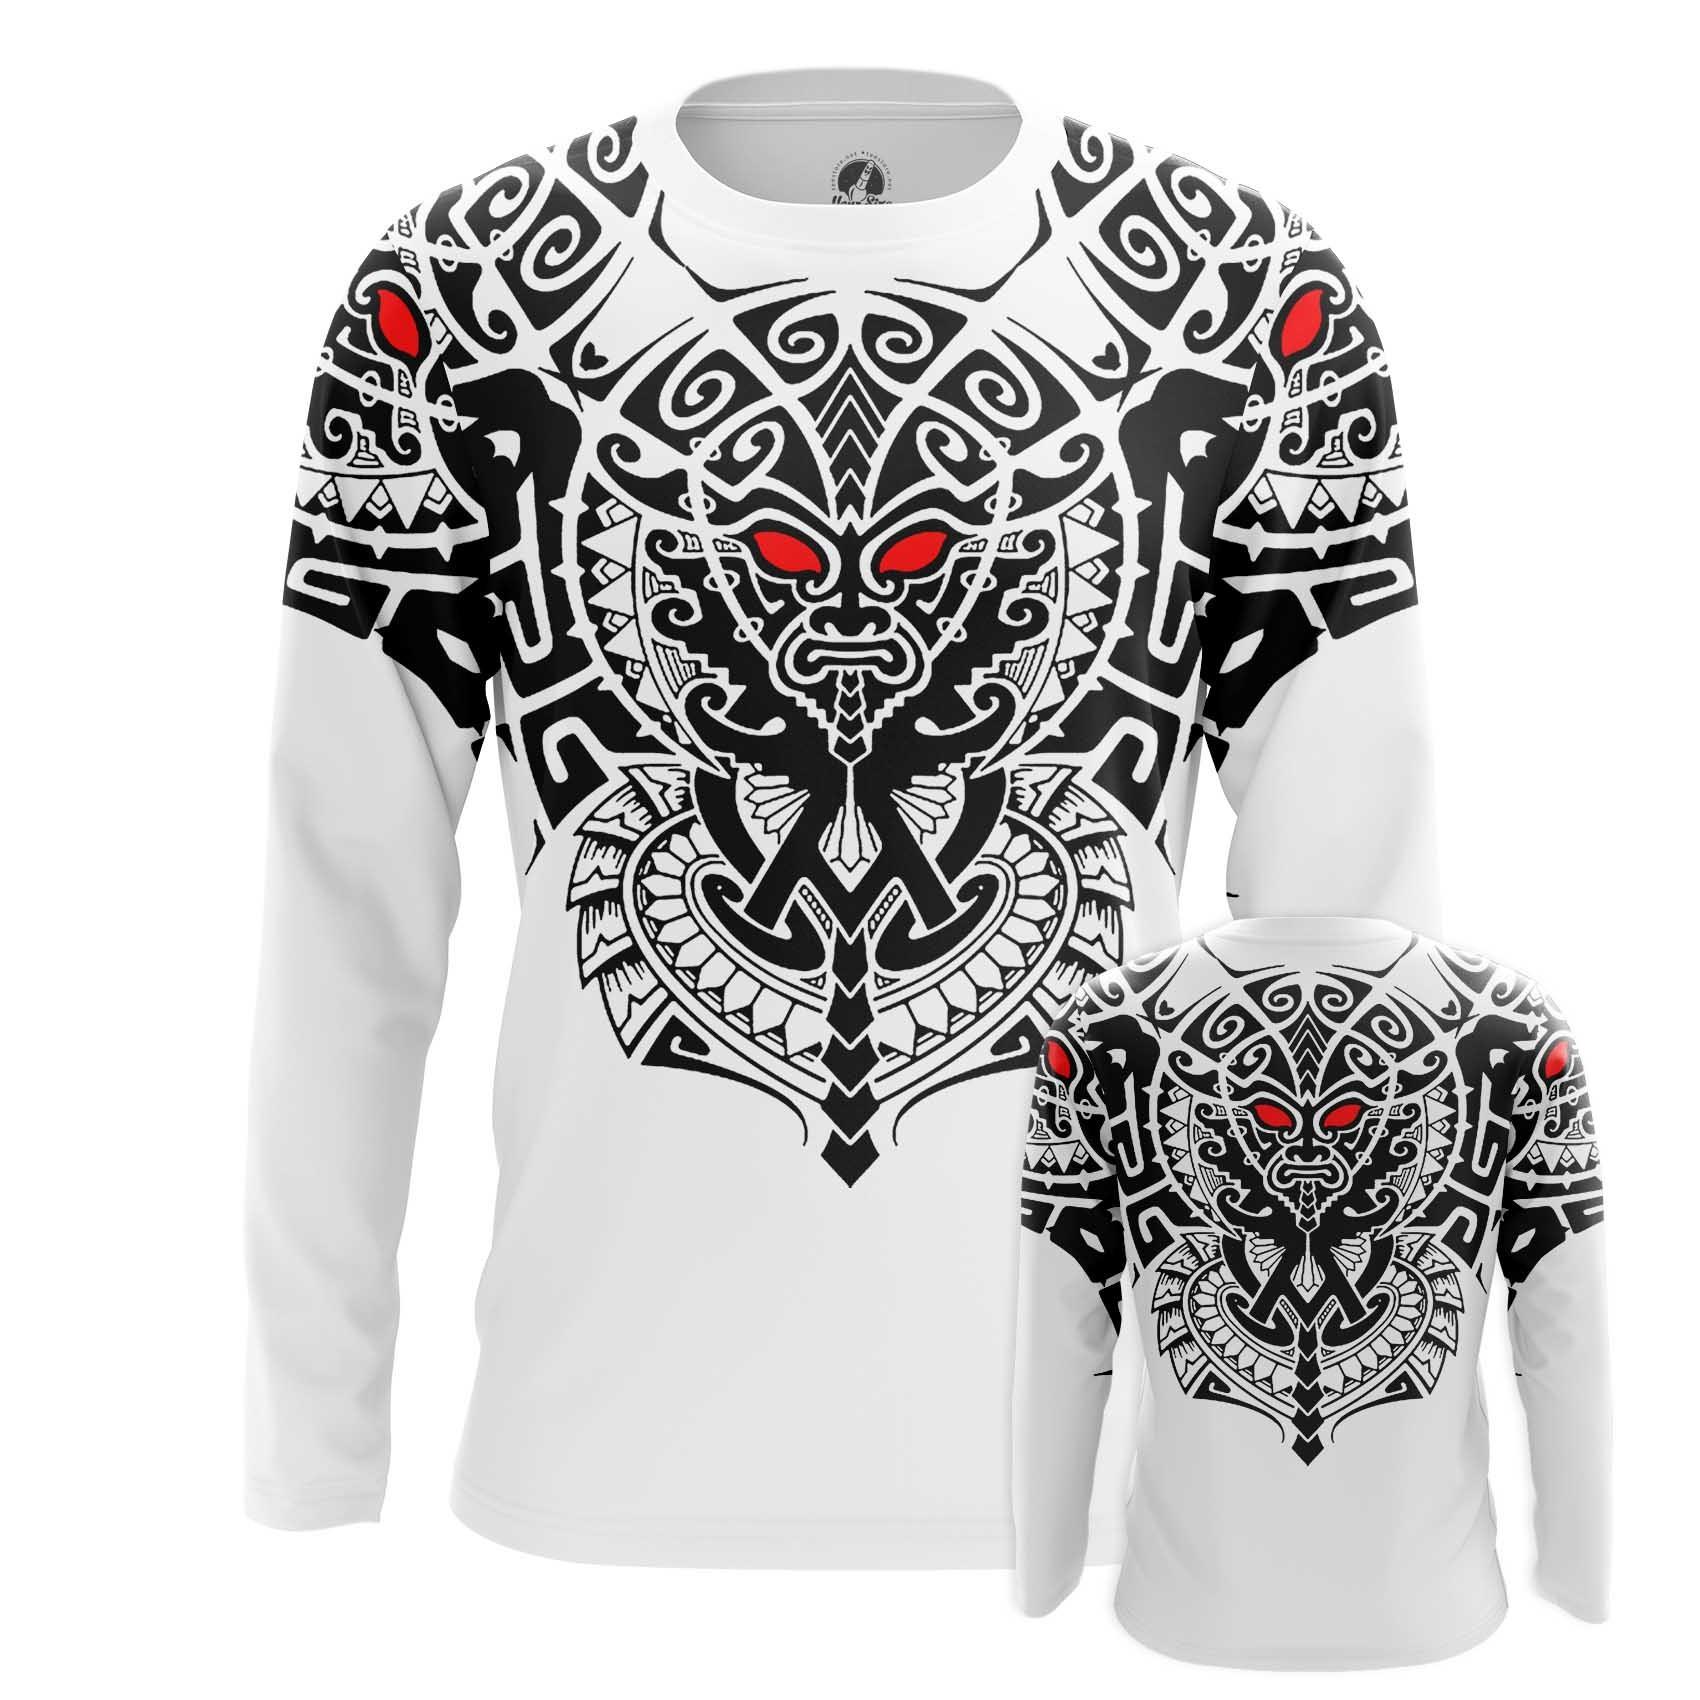 Merchandise Men'S Long Sleeve Maori Tattoos Print Clothes Pattern